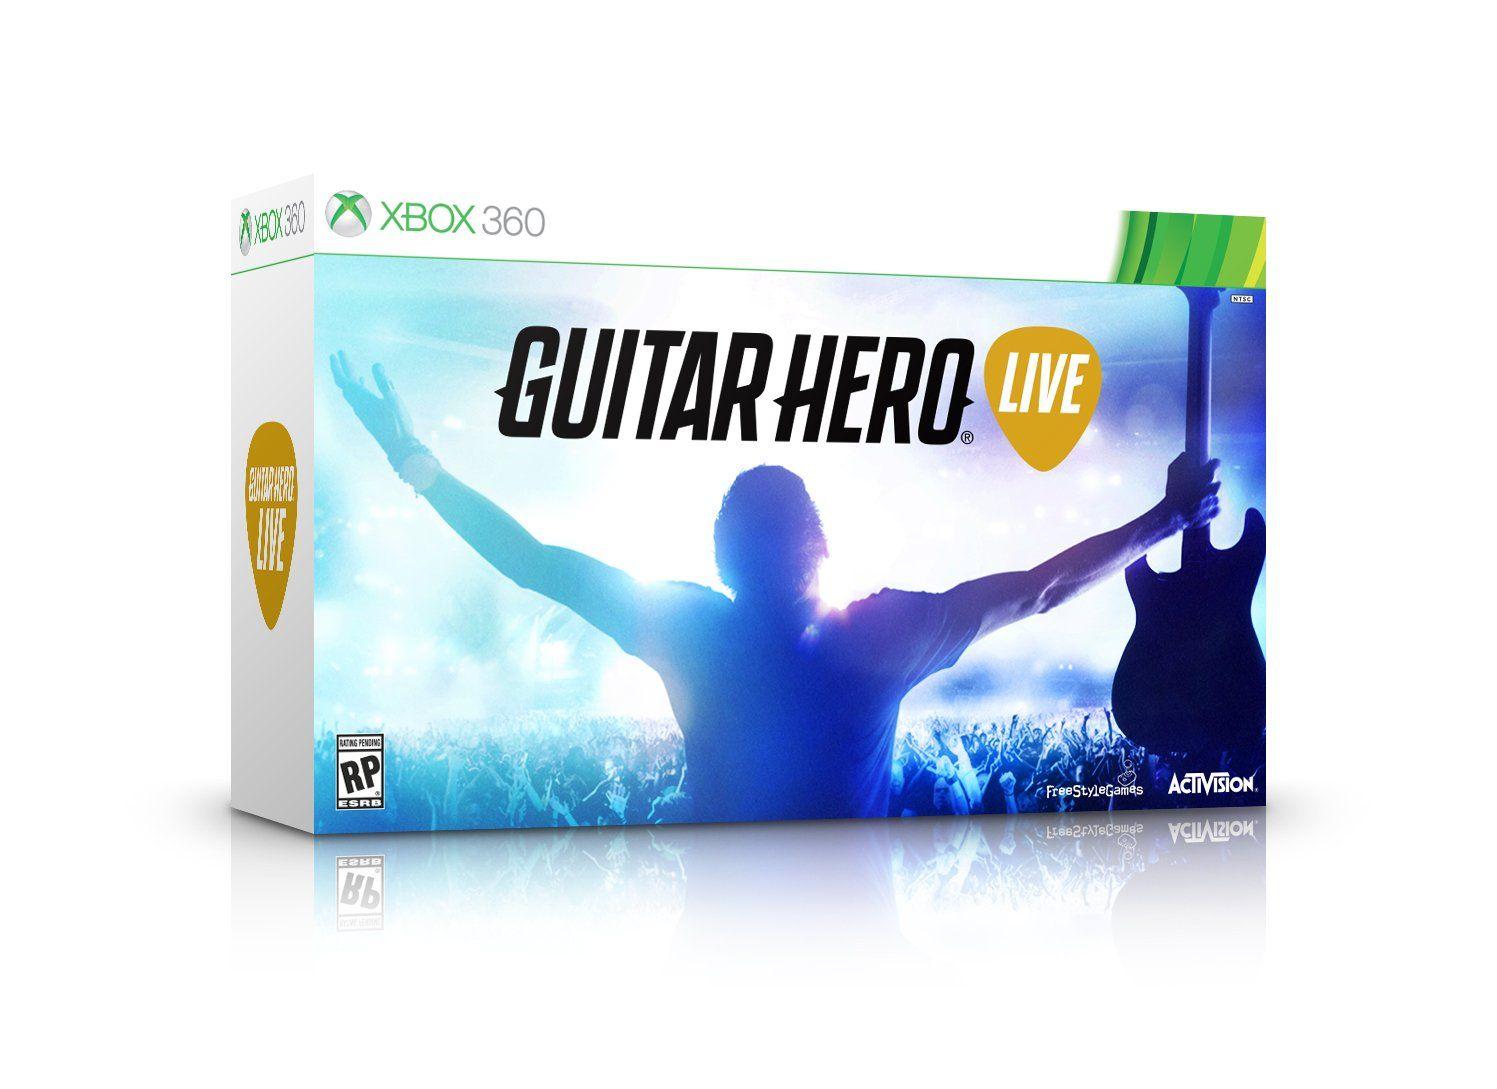 Guitar Hero Live - Xbox 360,#Hero, #Guitar, #Live, #Xbox ...